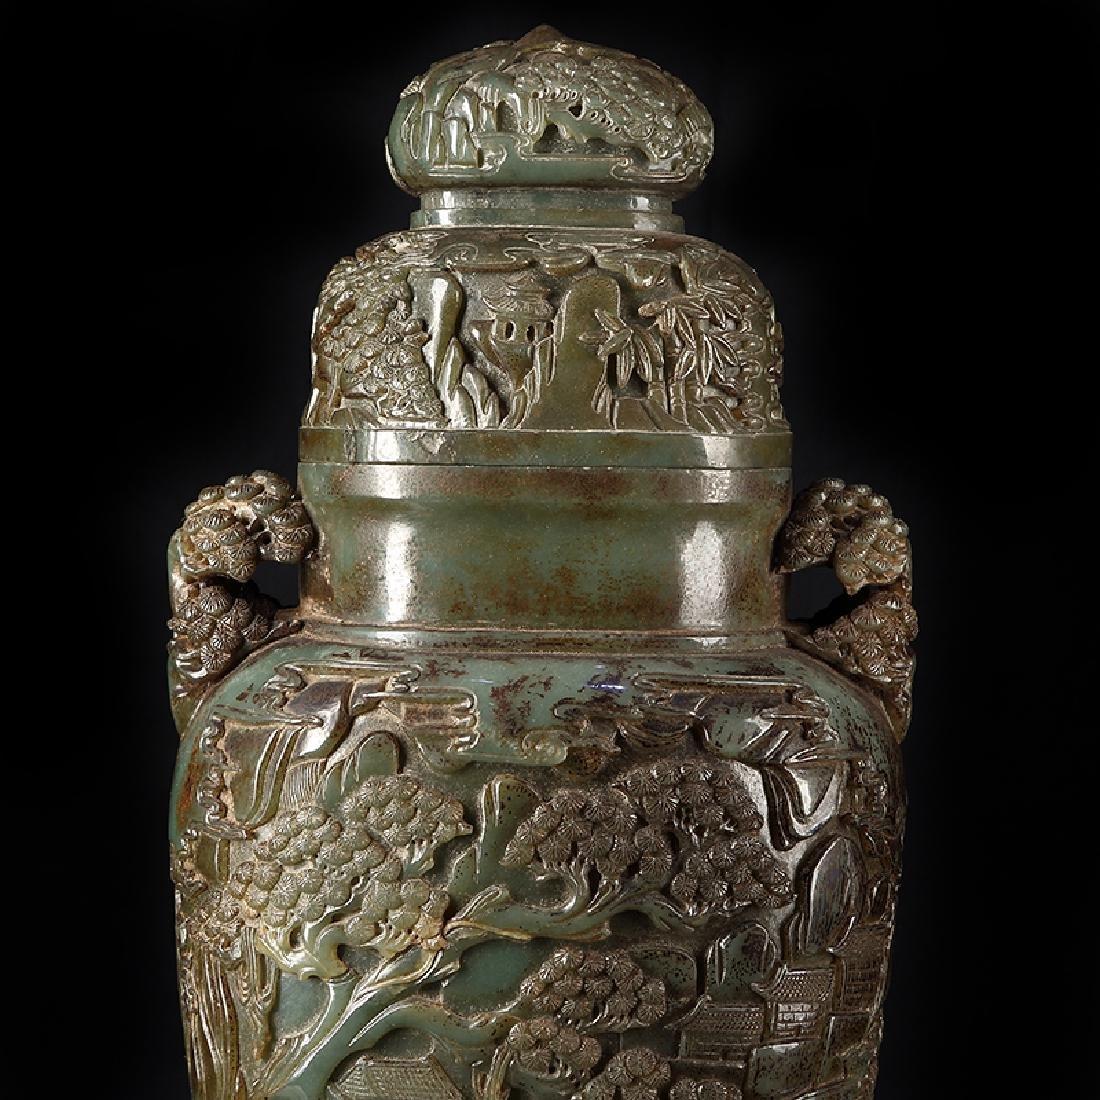 Large Chinese Qing Dynasty Hetian Jade  Vase - 2